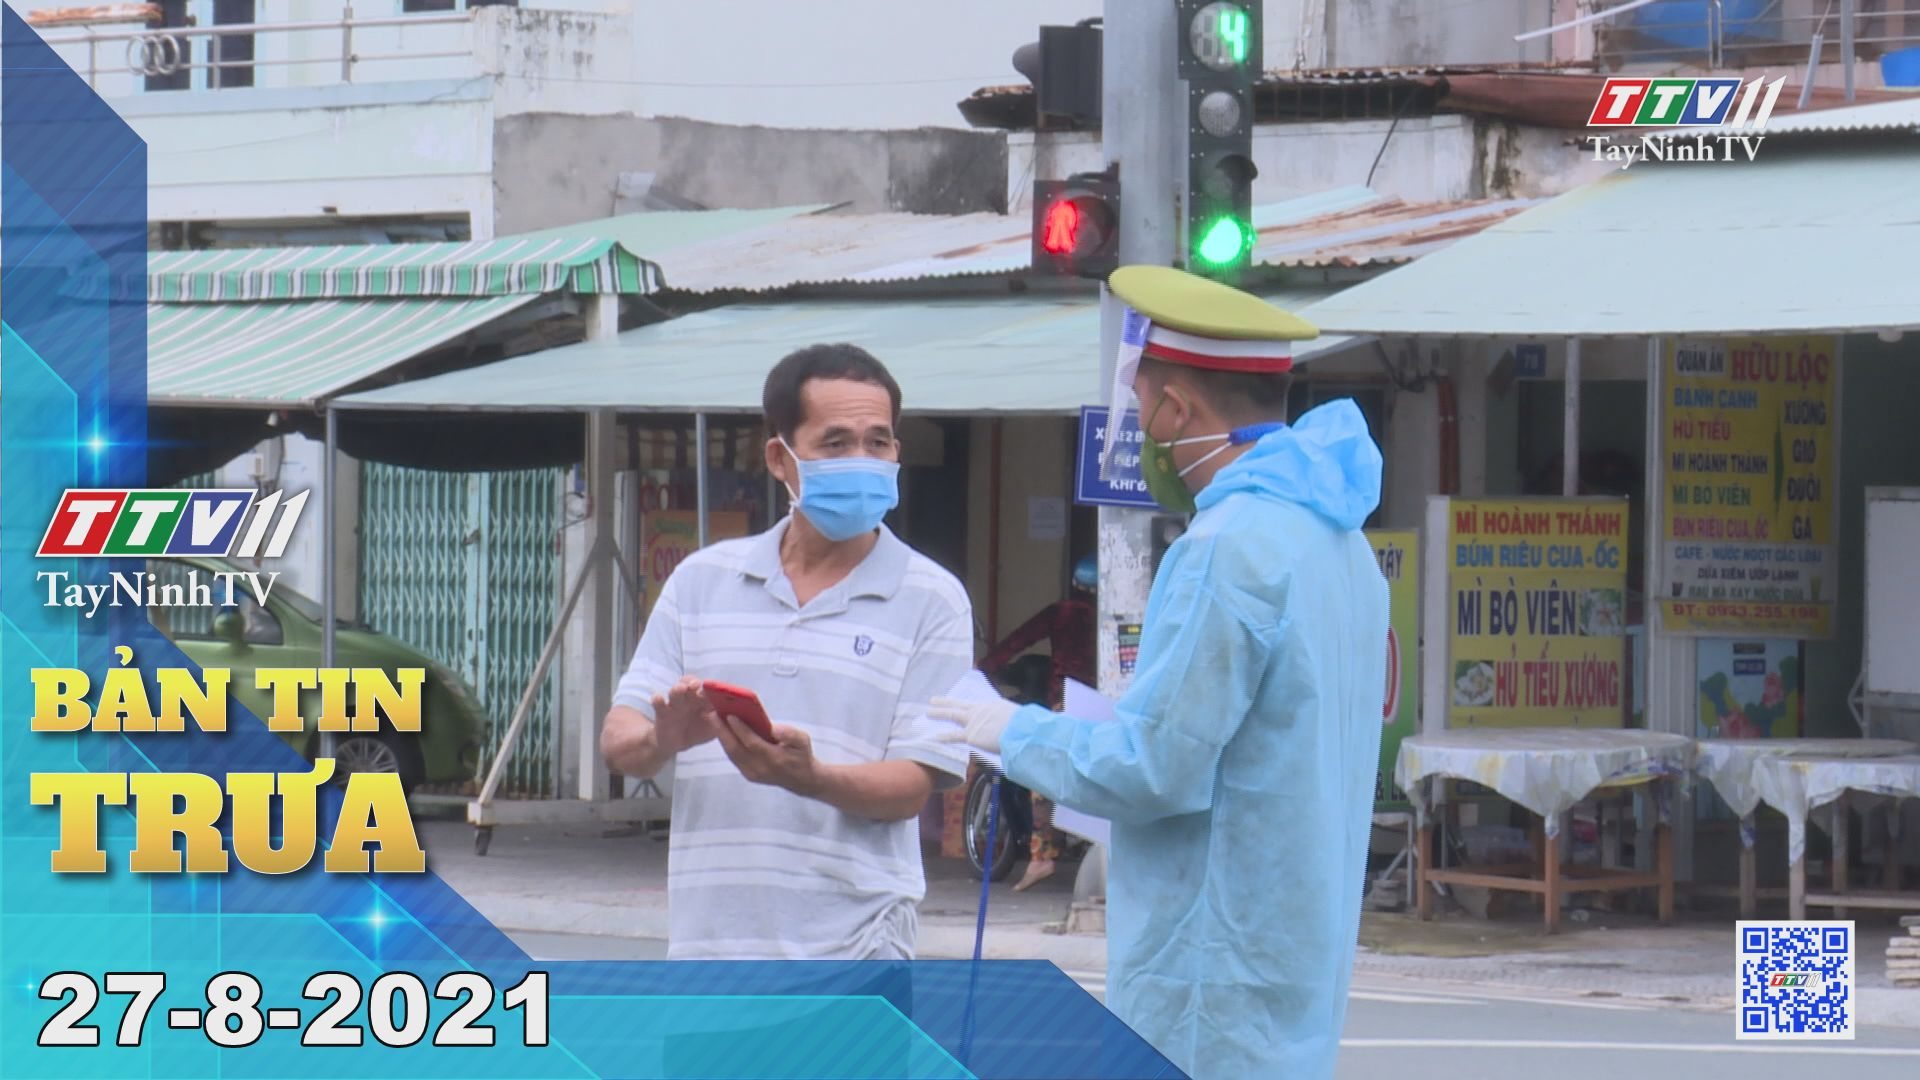 Bản tin trưa 27-8-2021 | Tin tức hôm nay | TayNinhTV